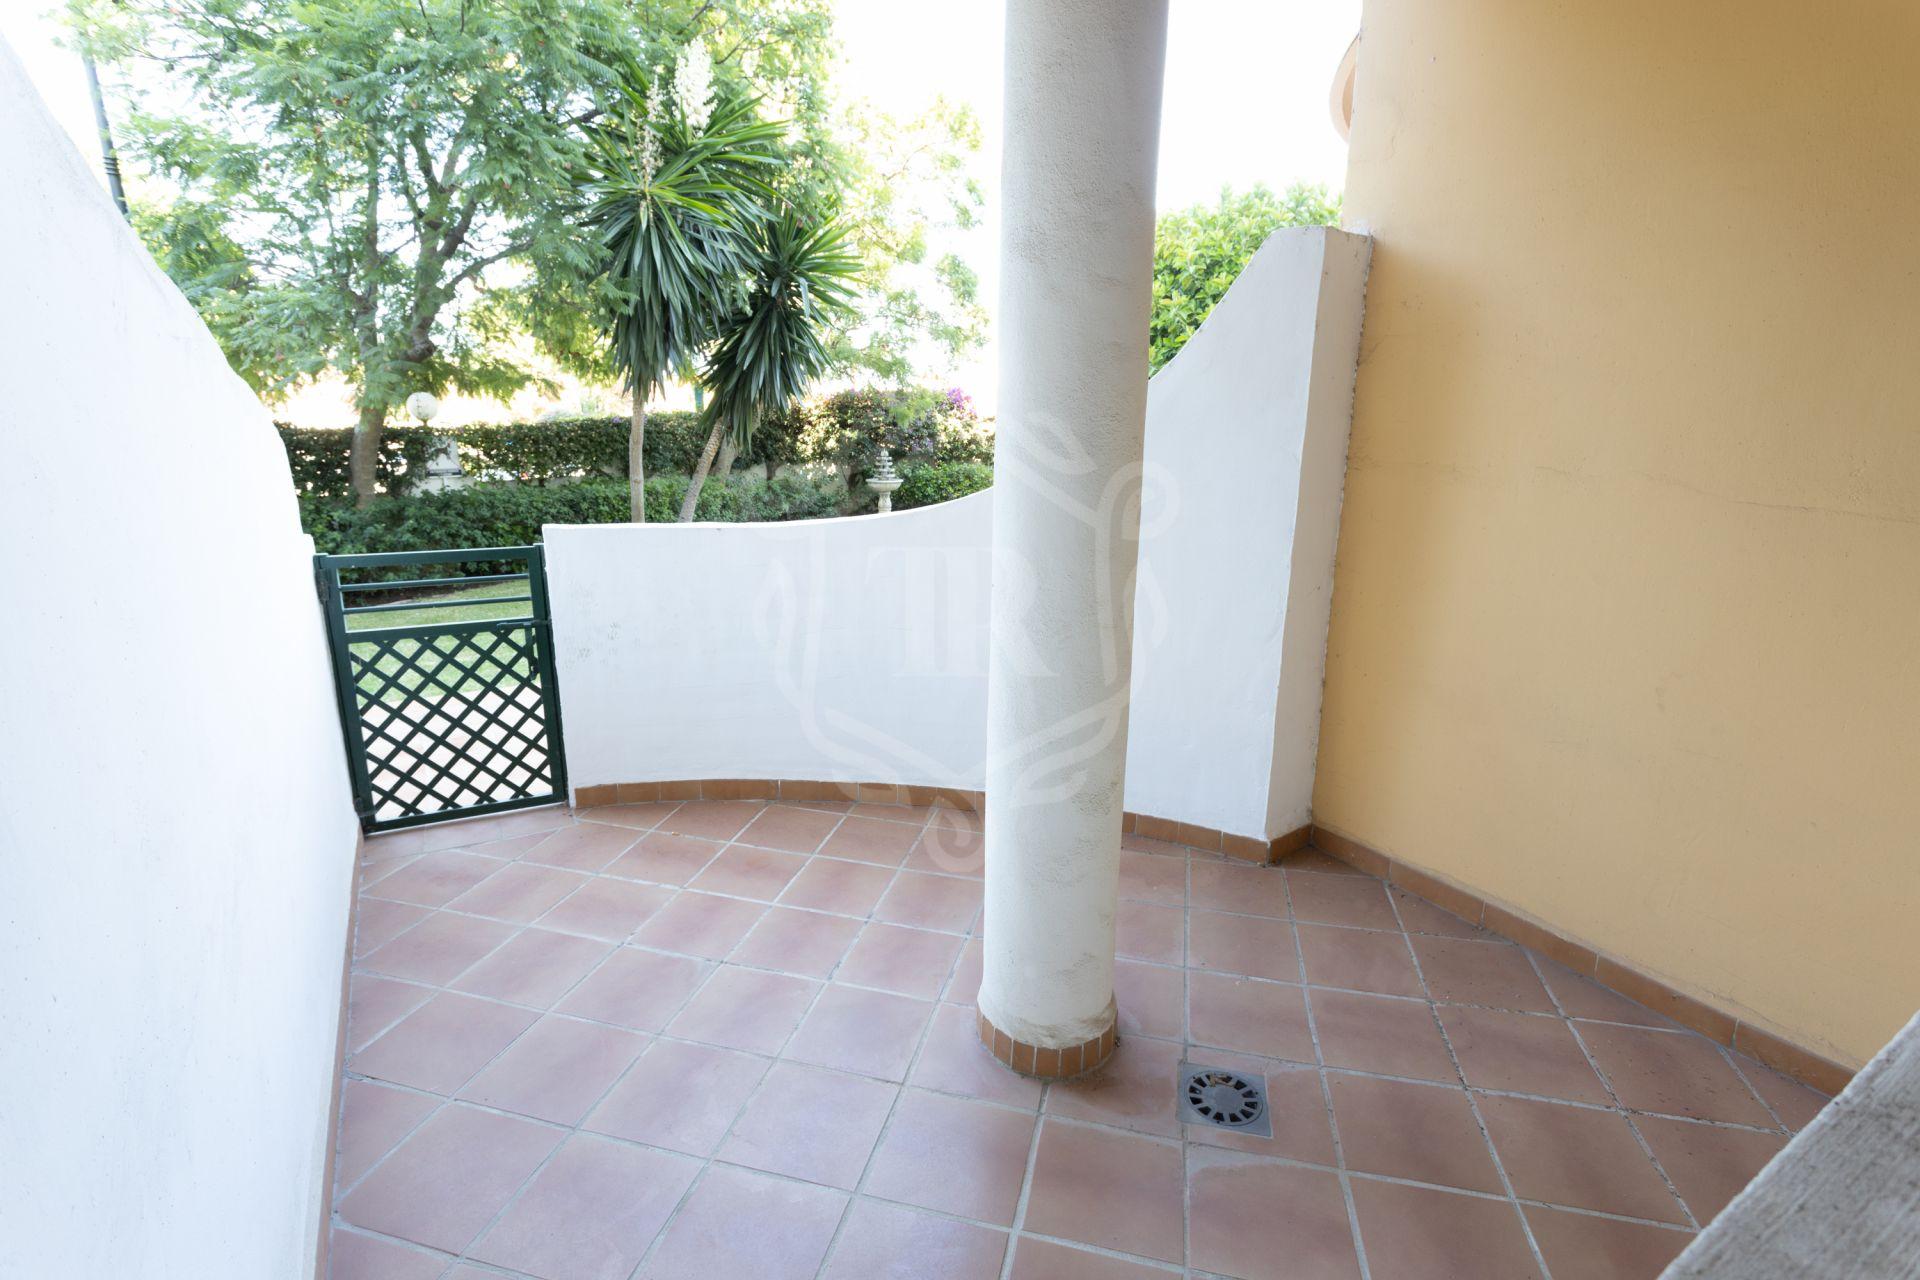 Duplex for sale in Señorio de Aloha, Nueva Andalucia